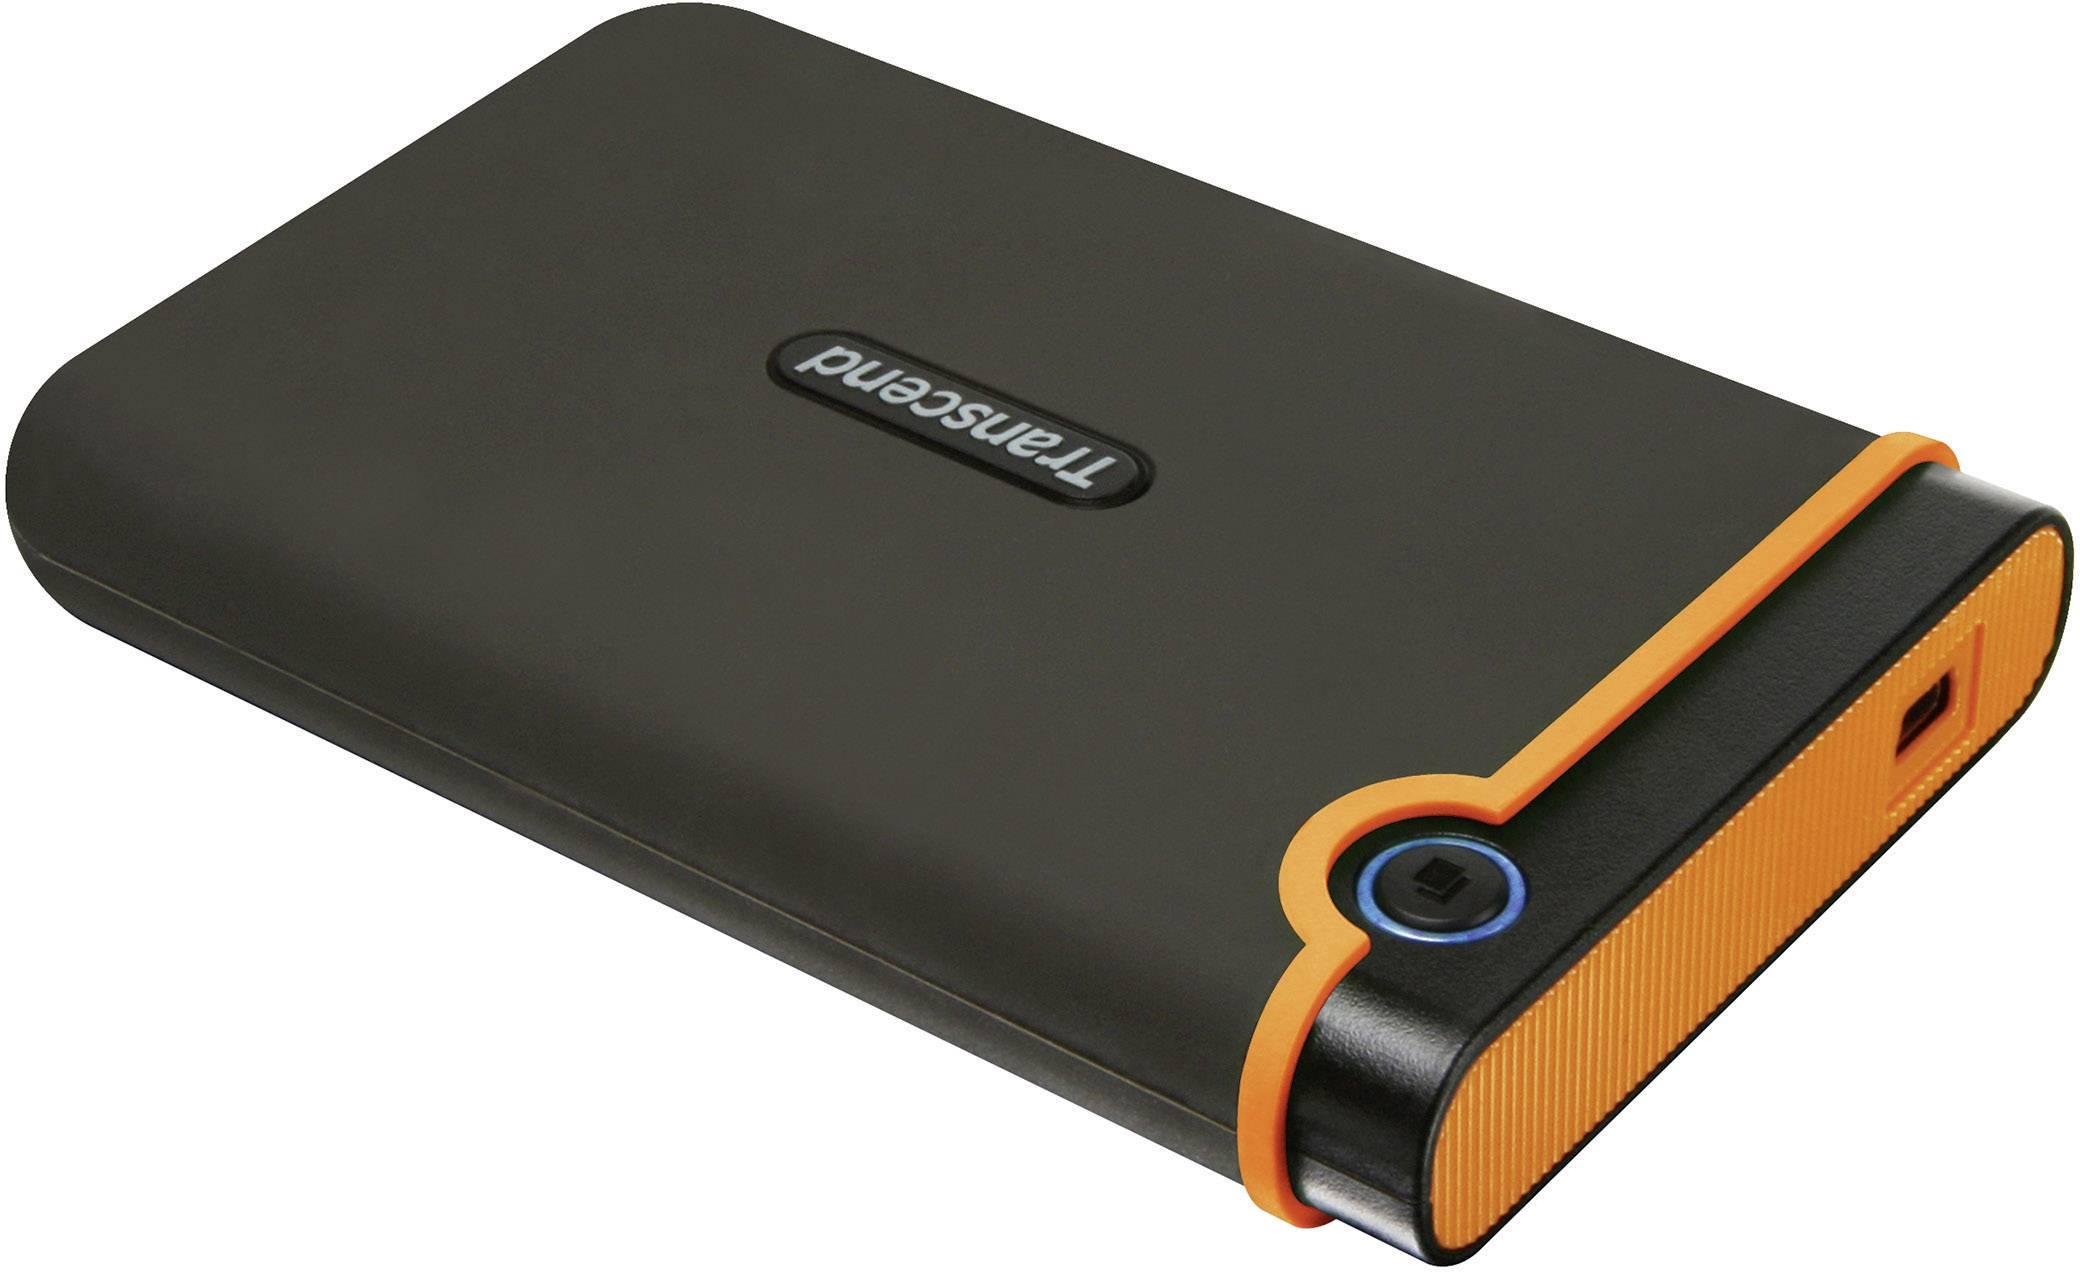 "Externý pevný disk 6,35 cm (2,5"") Transcend StoreJet 25M2, 1 TB, USB 2.0, tmavosivá, oranžová"